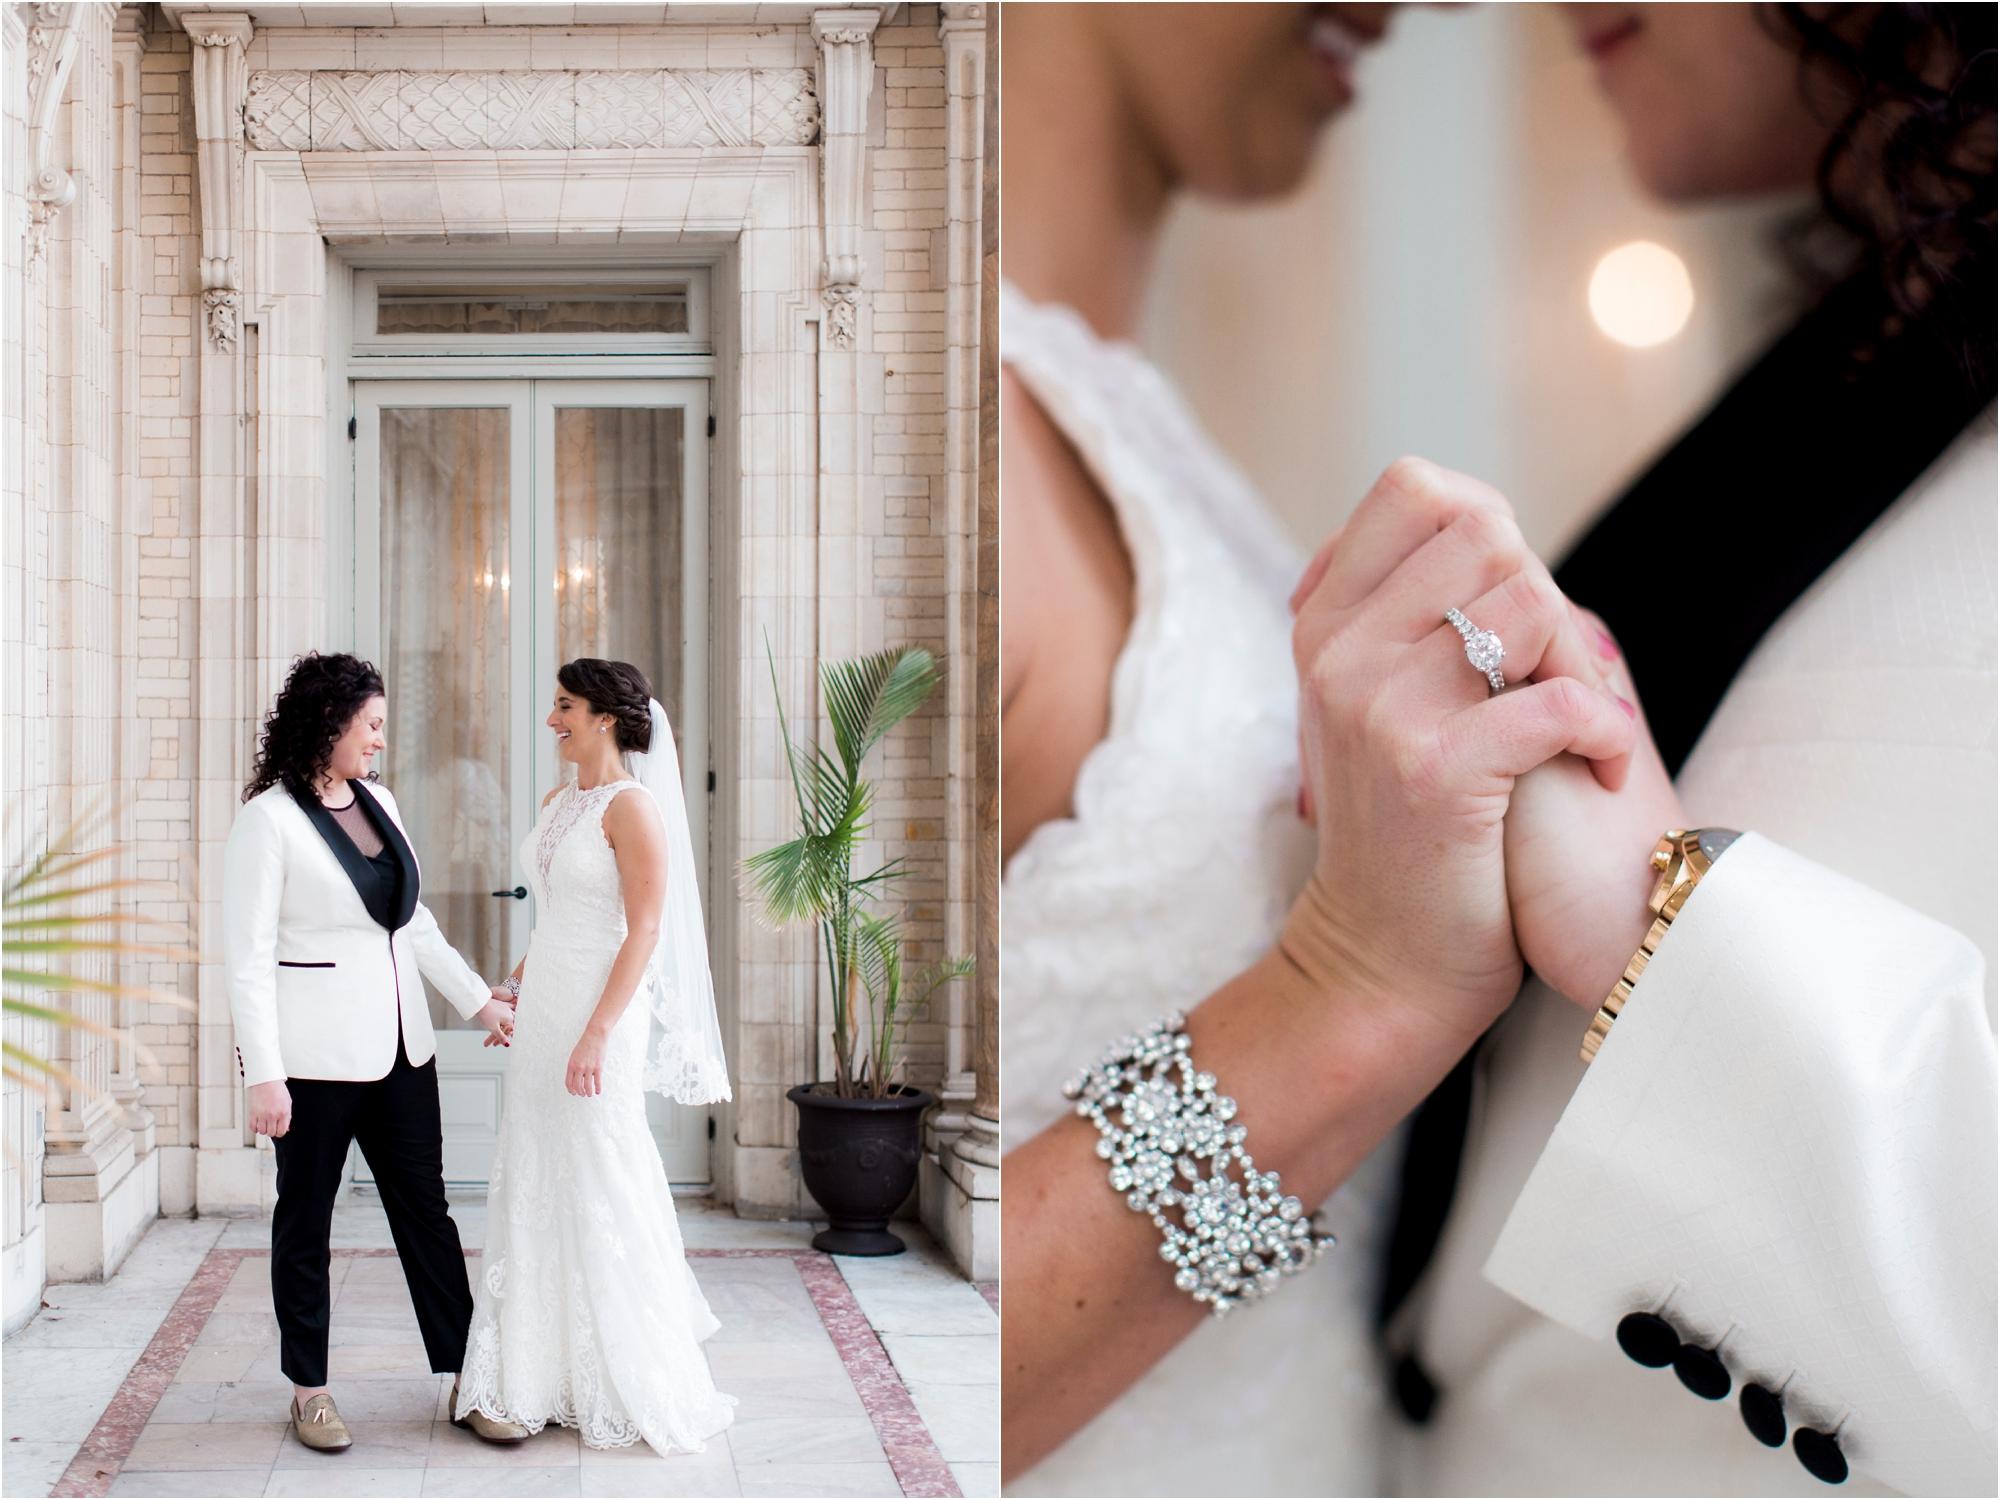 phoebe-mayme-richmond-virginia-colorful-love-is-love-wedding-photos_0002.jpg